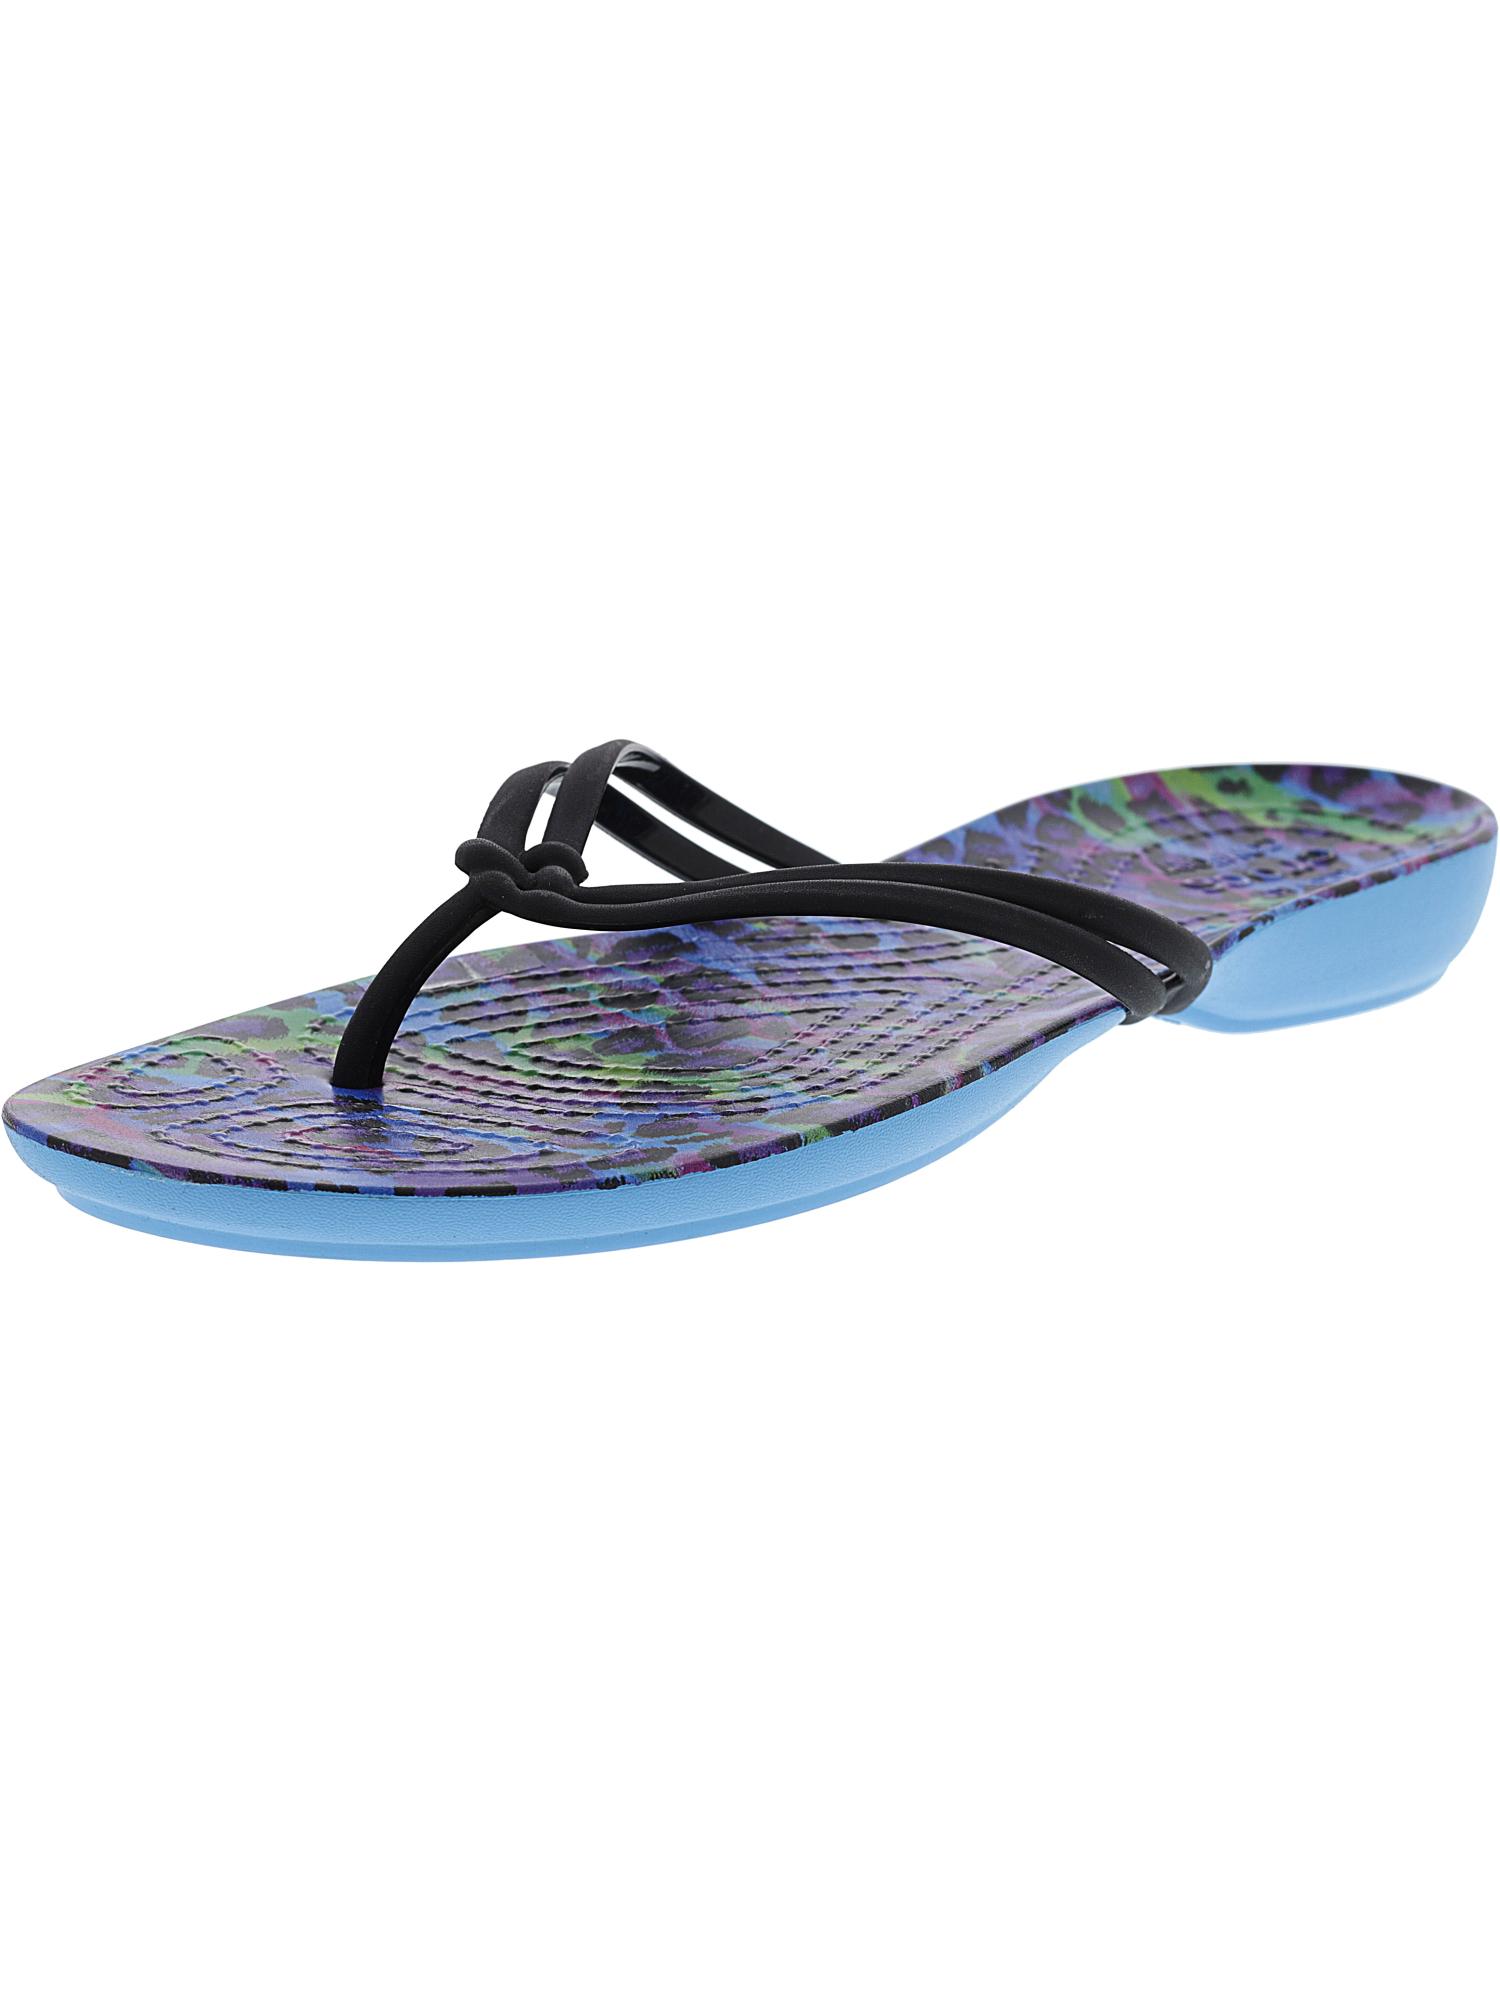 737f5dea0 Crocs Women s Kadee Ii Leopard Print Flip Flop Ltd Sandal